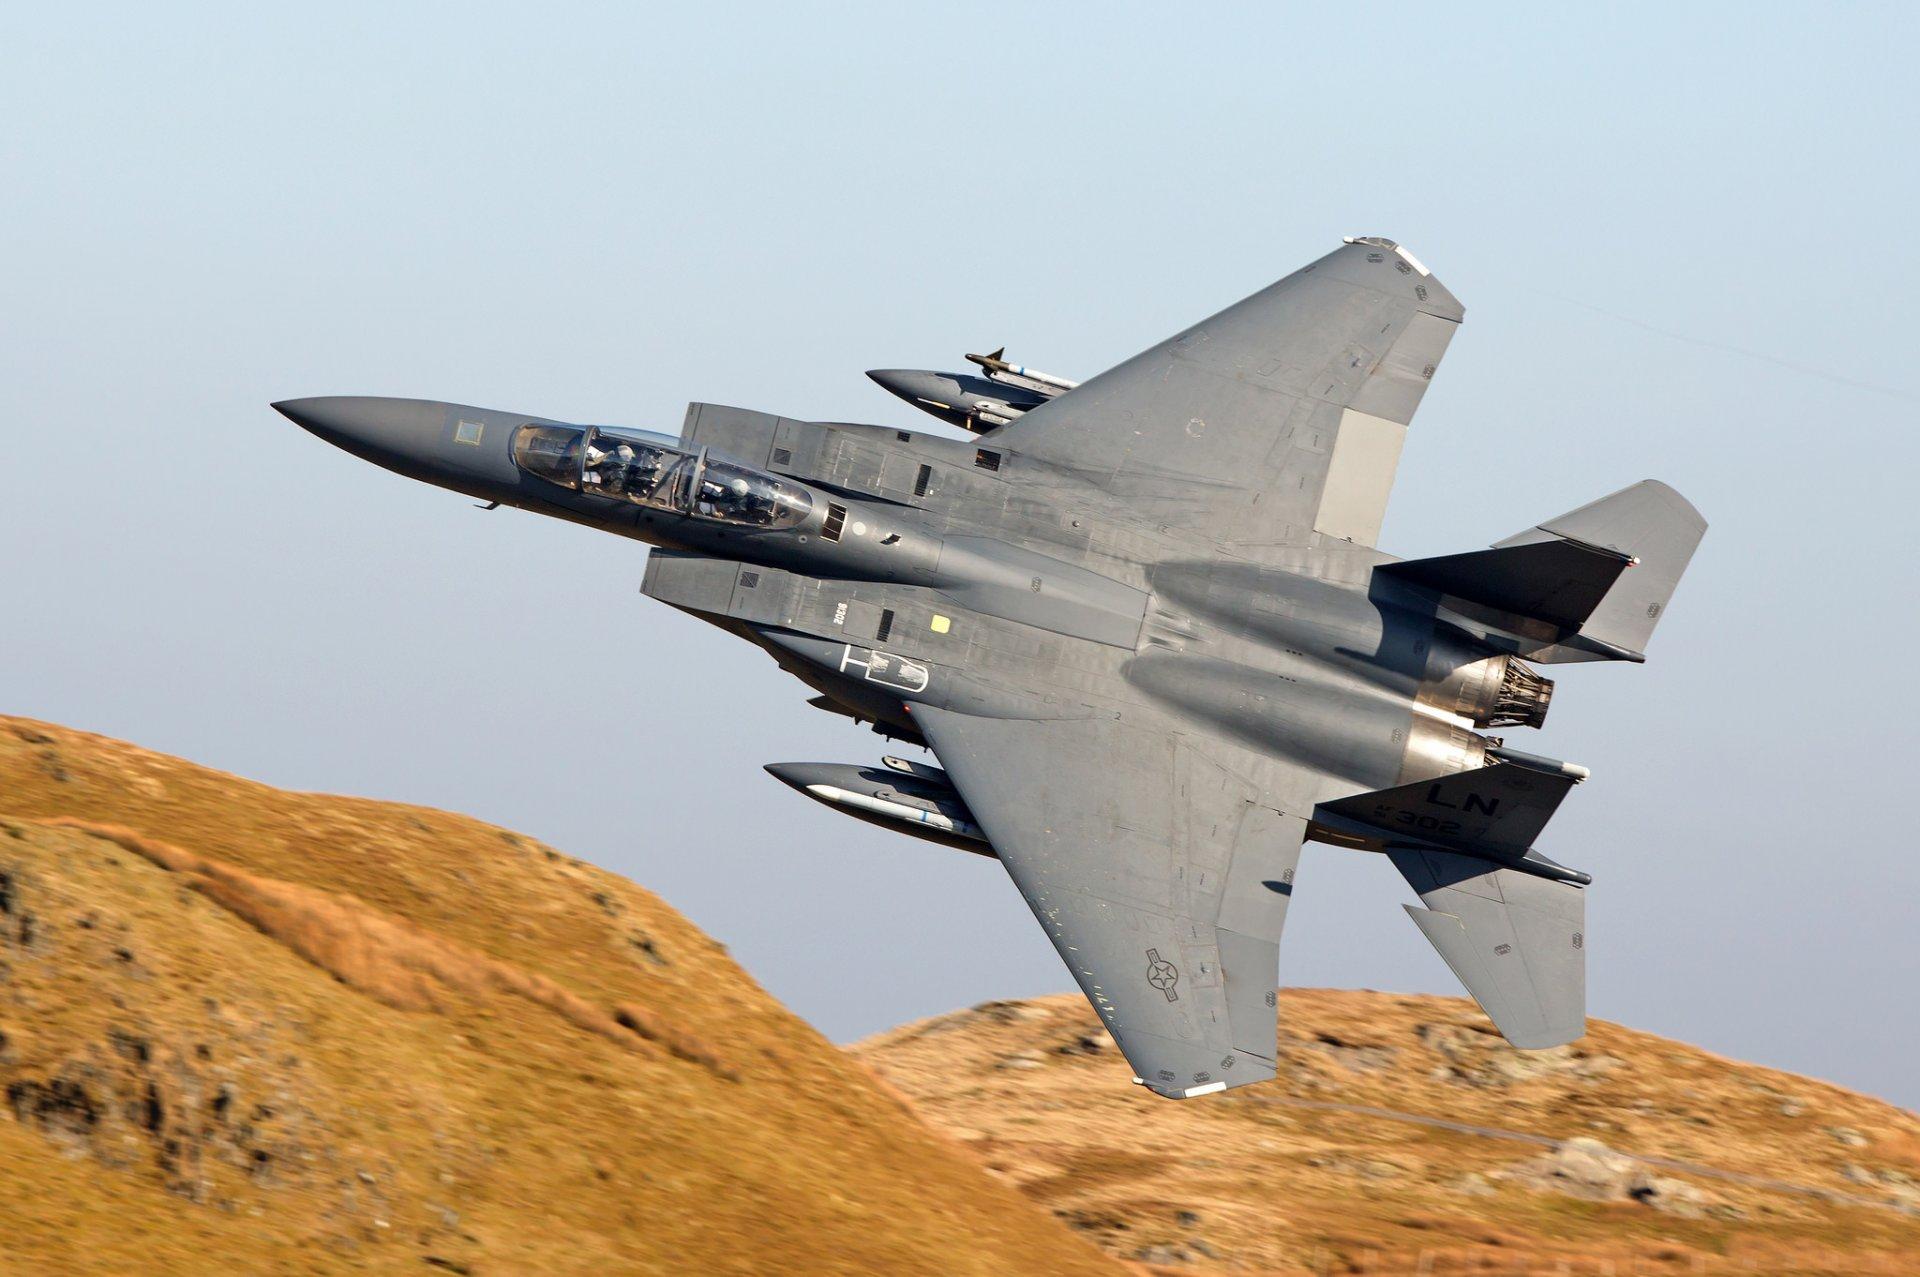 Обои Mcdonnell douglas, истребитель, Самолёт, eagle, Облака. Авиация foto 15